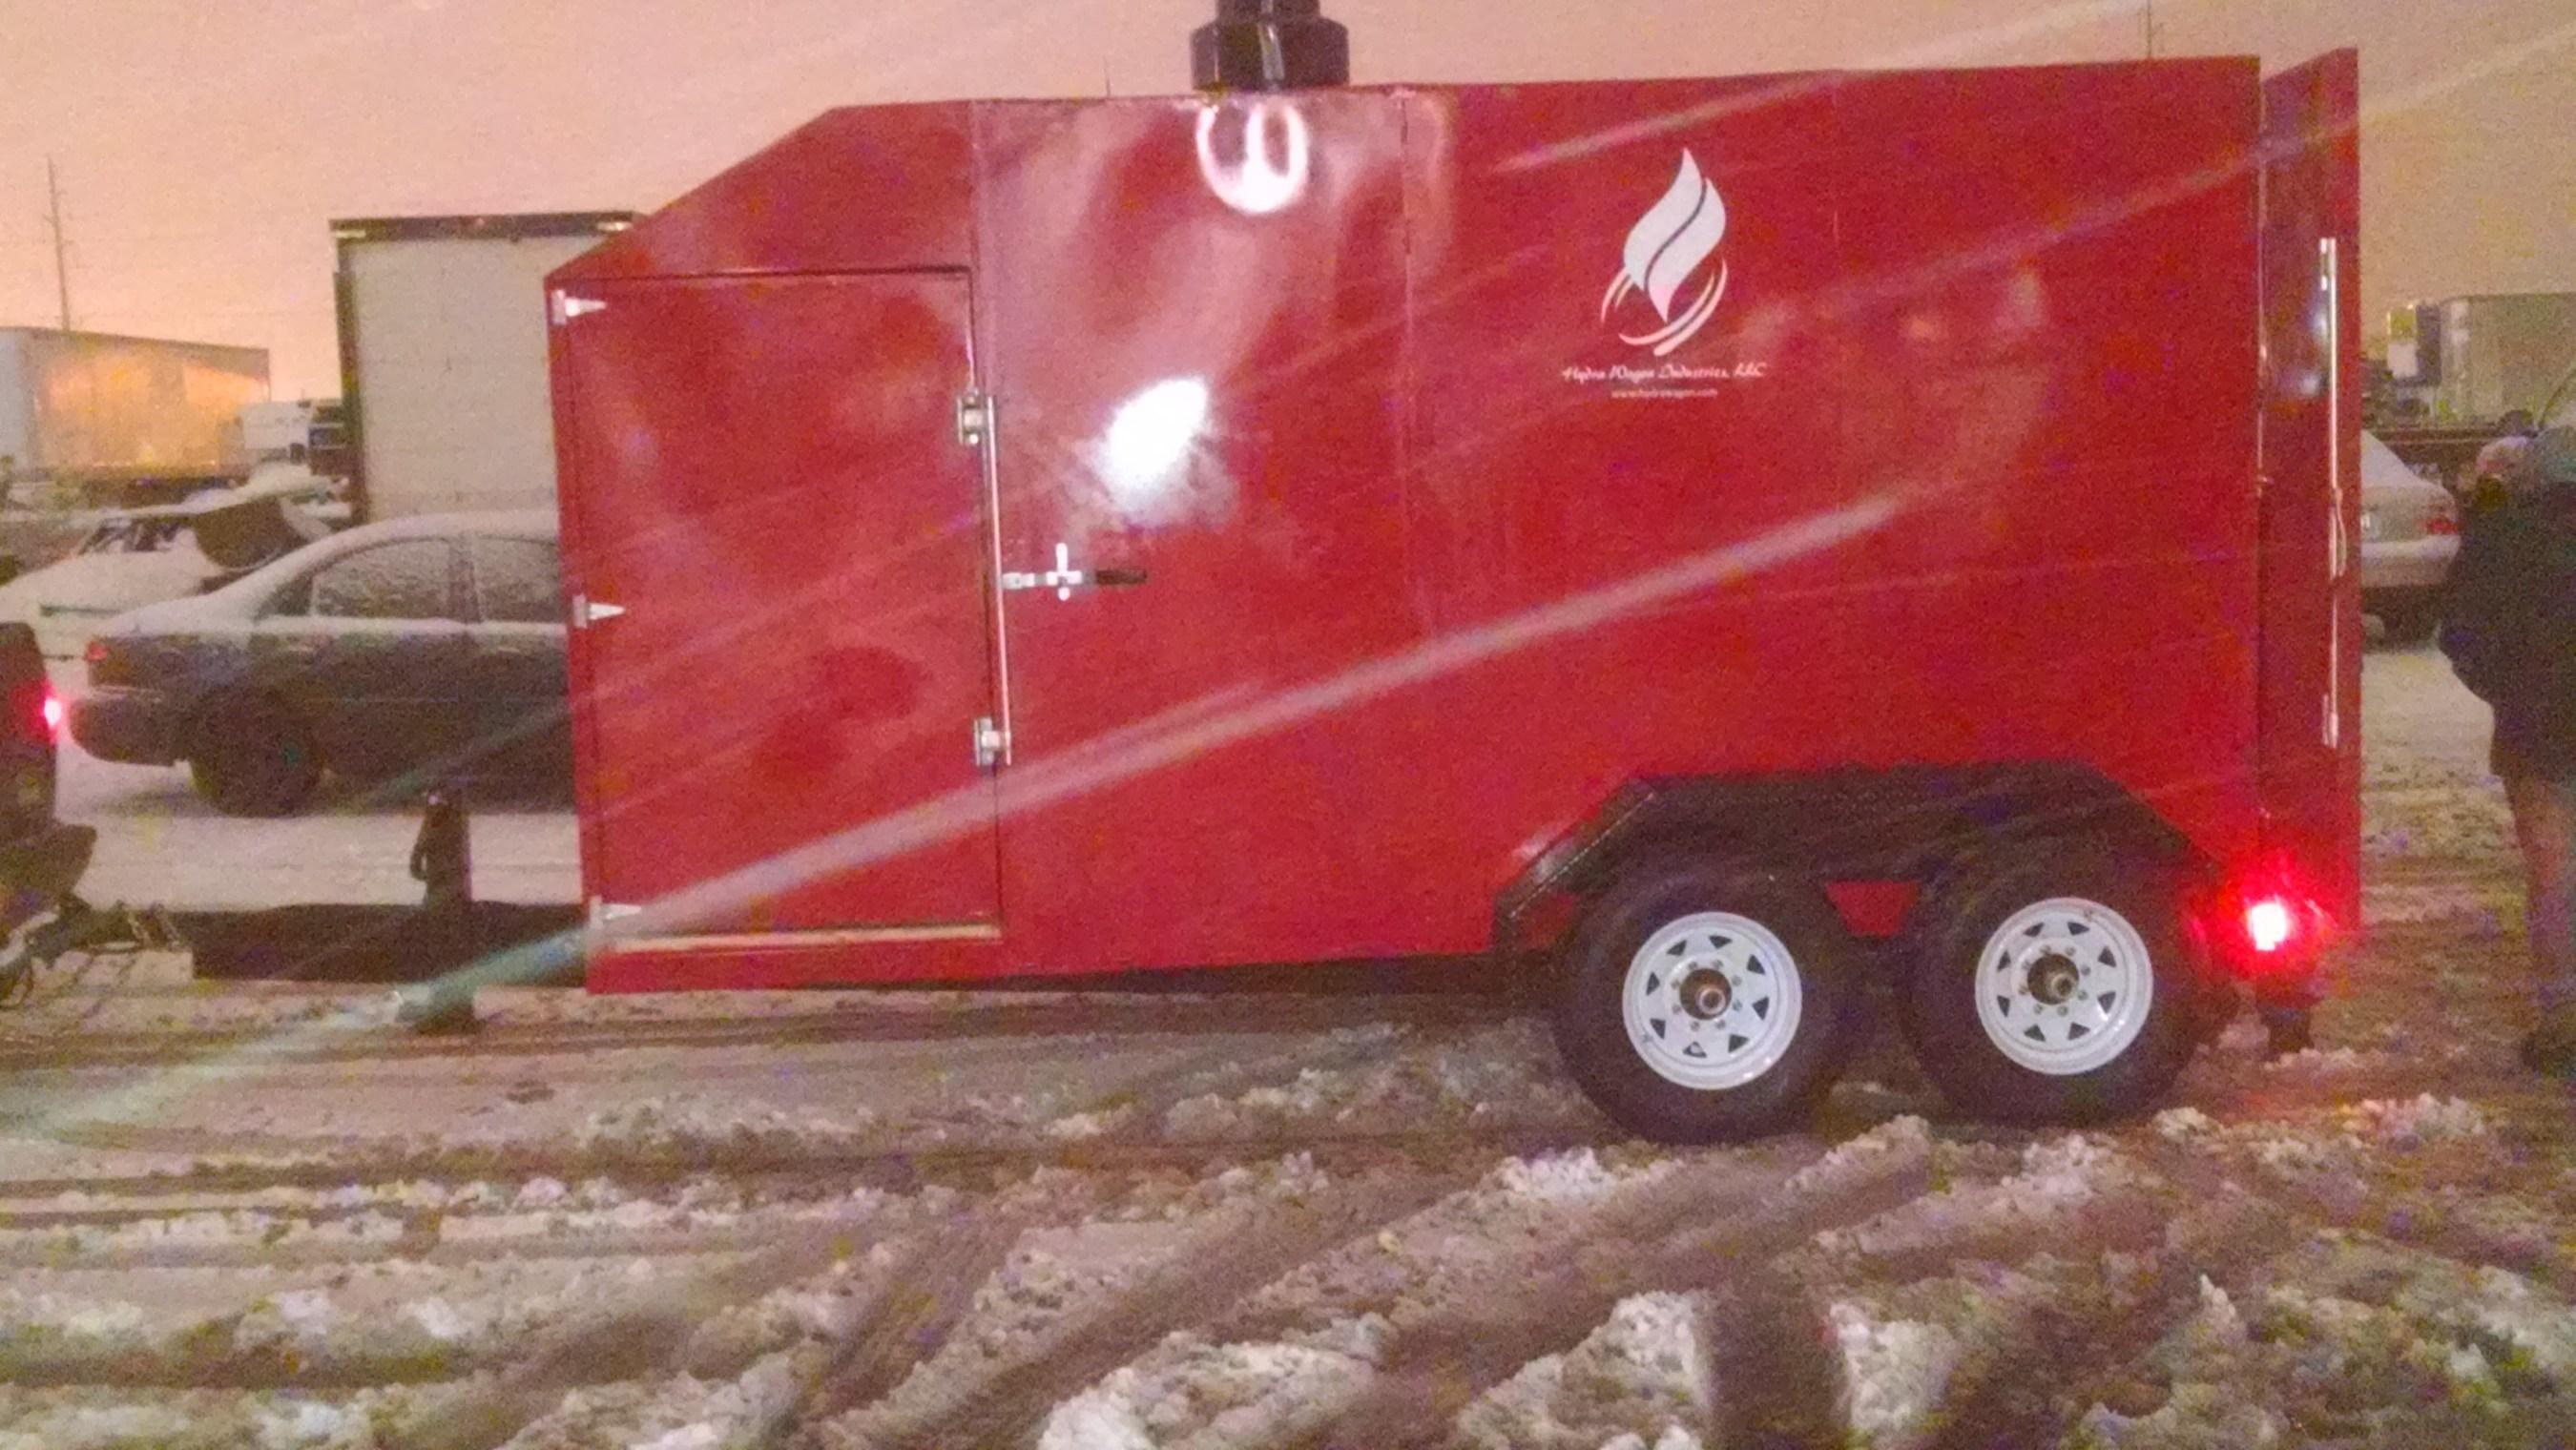 Hydra Wagon Industries Presents Latest Model Portable Heater